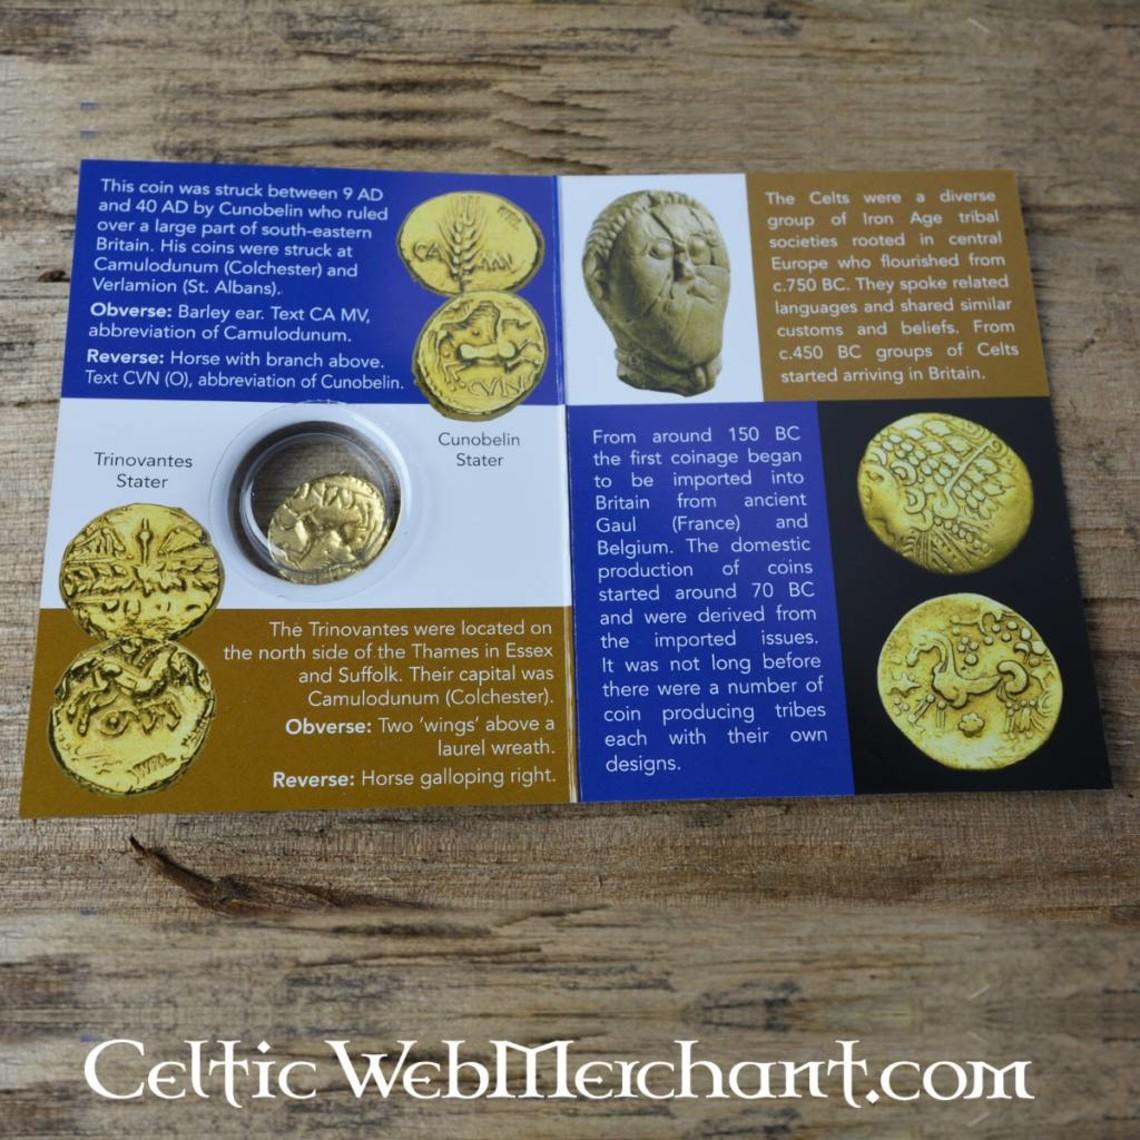 Cunobelino moneda celta